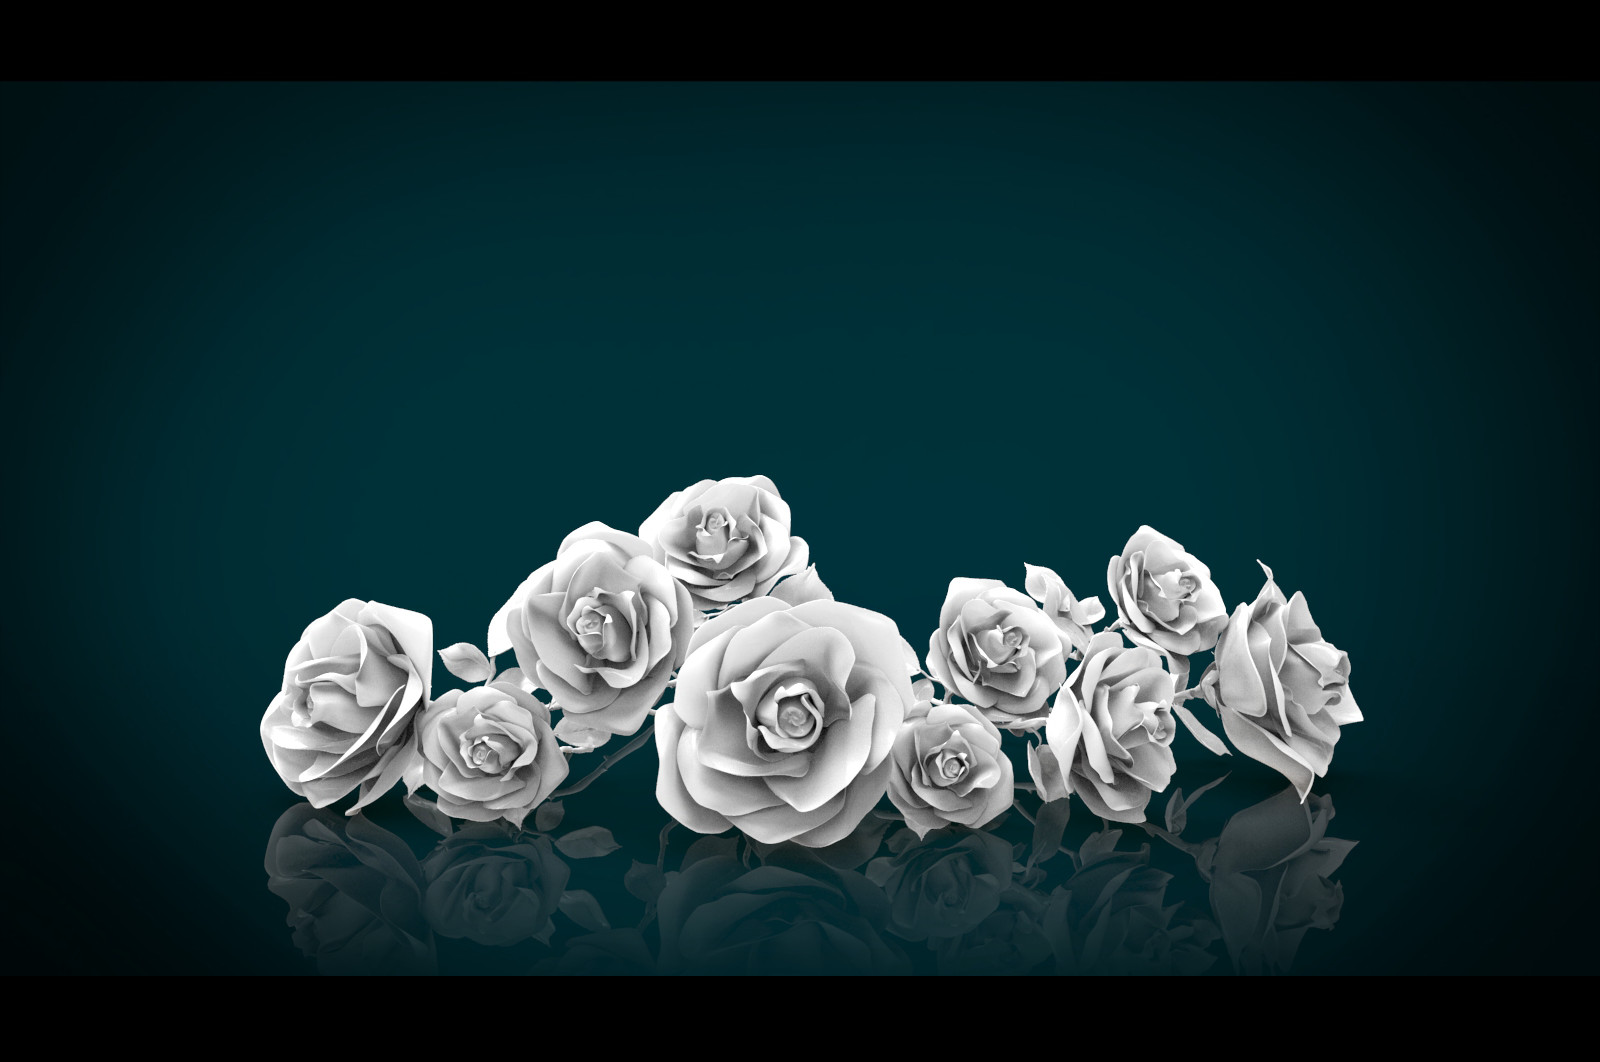 Maite vandewalle roses